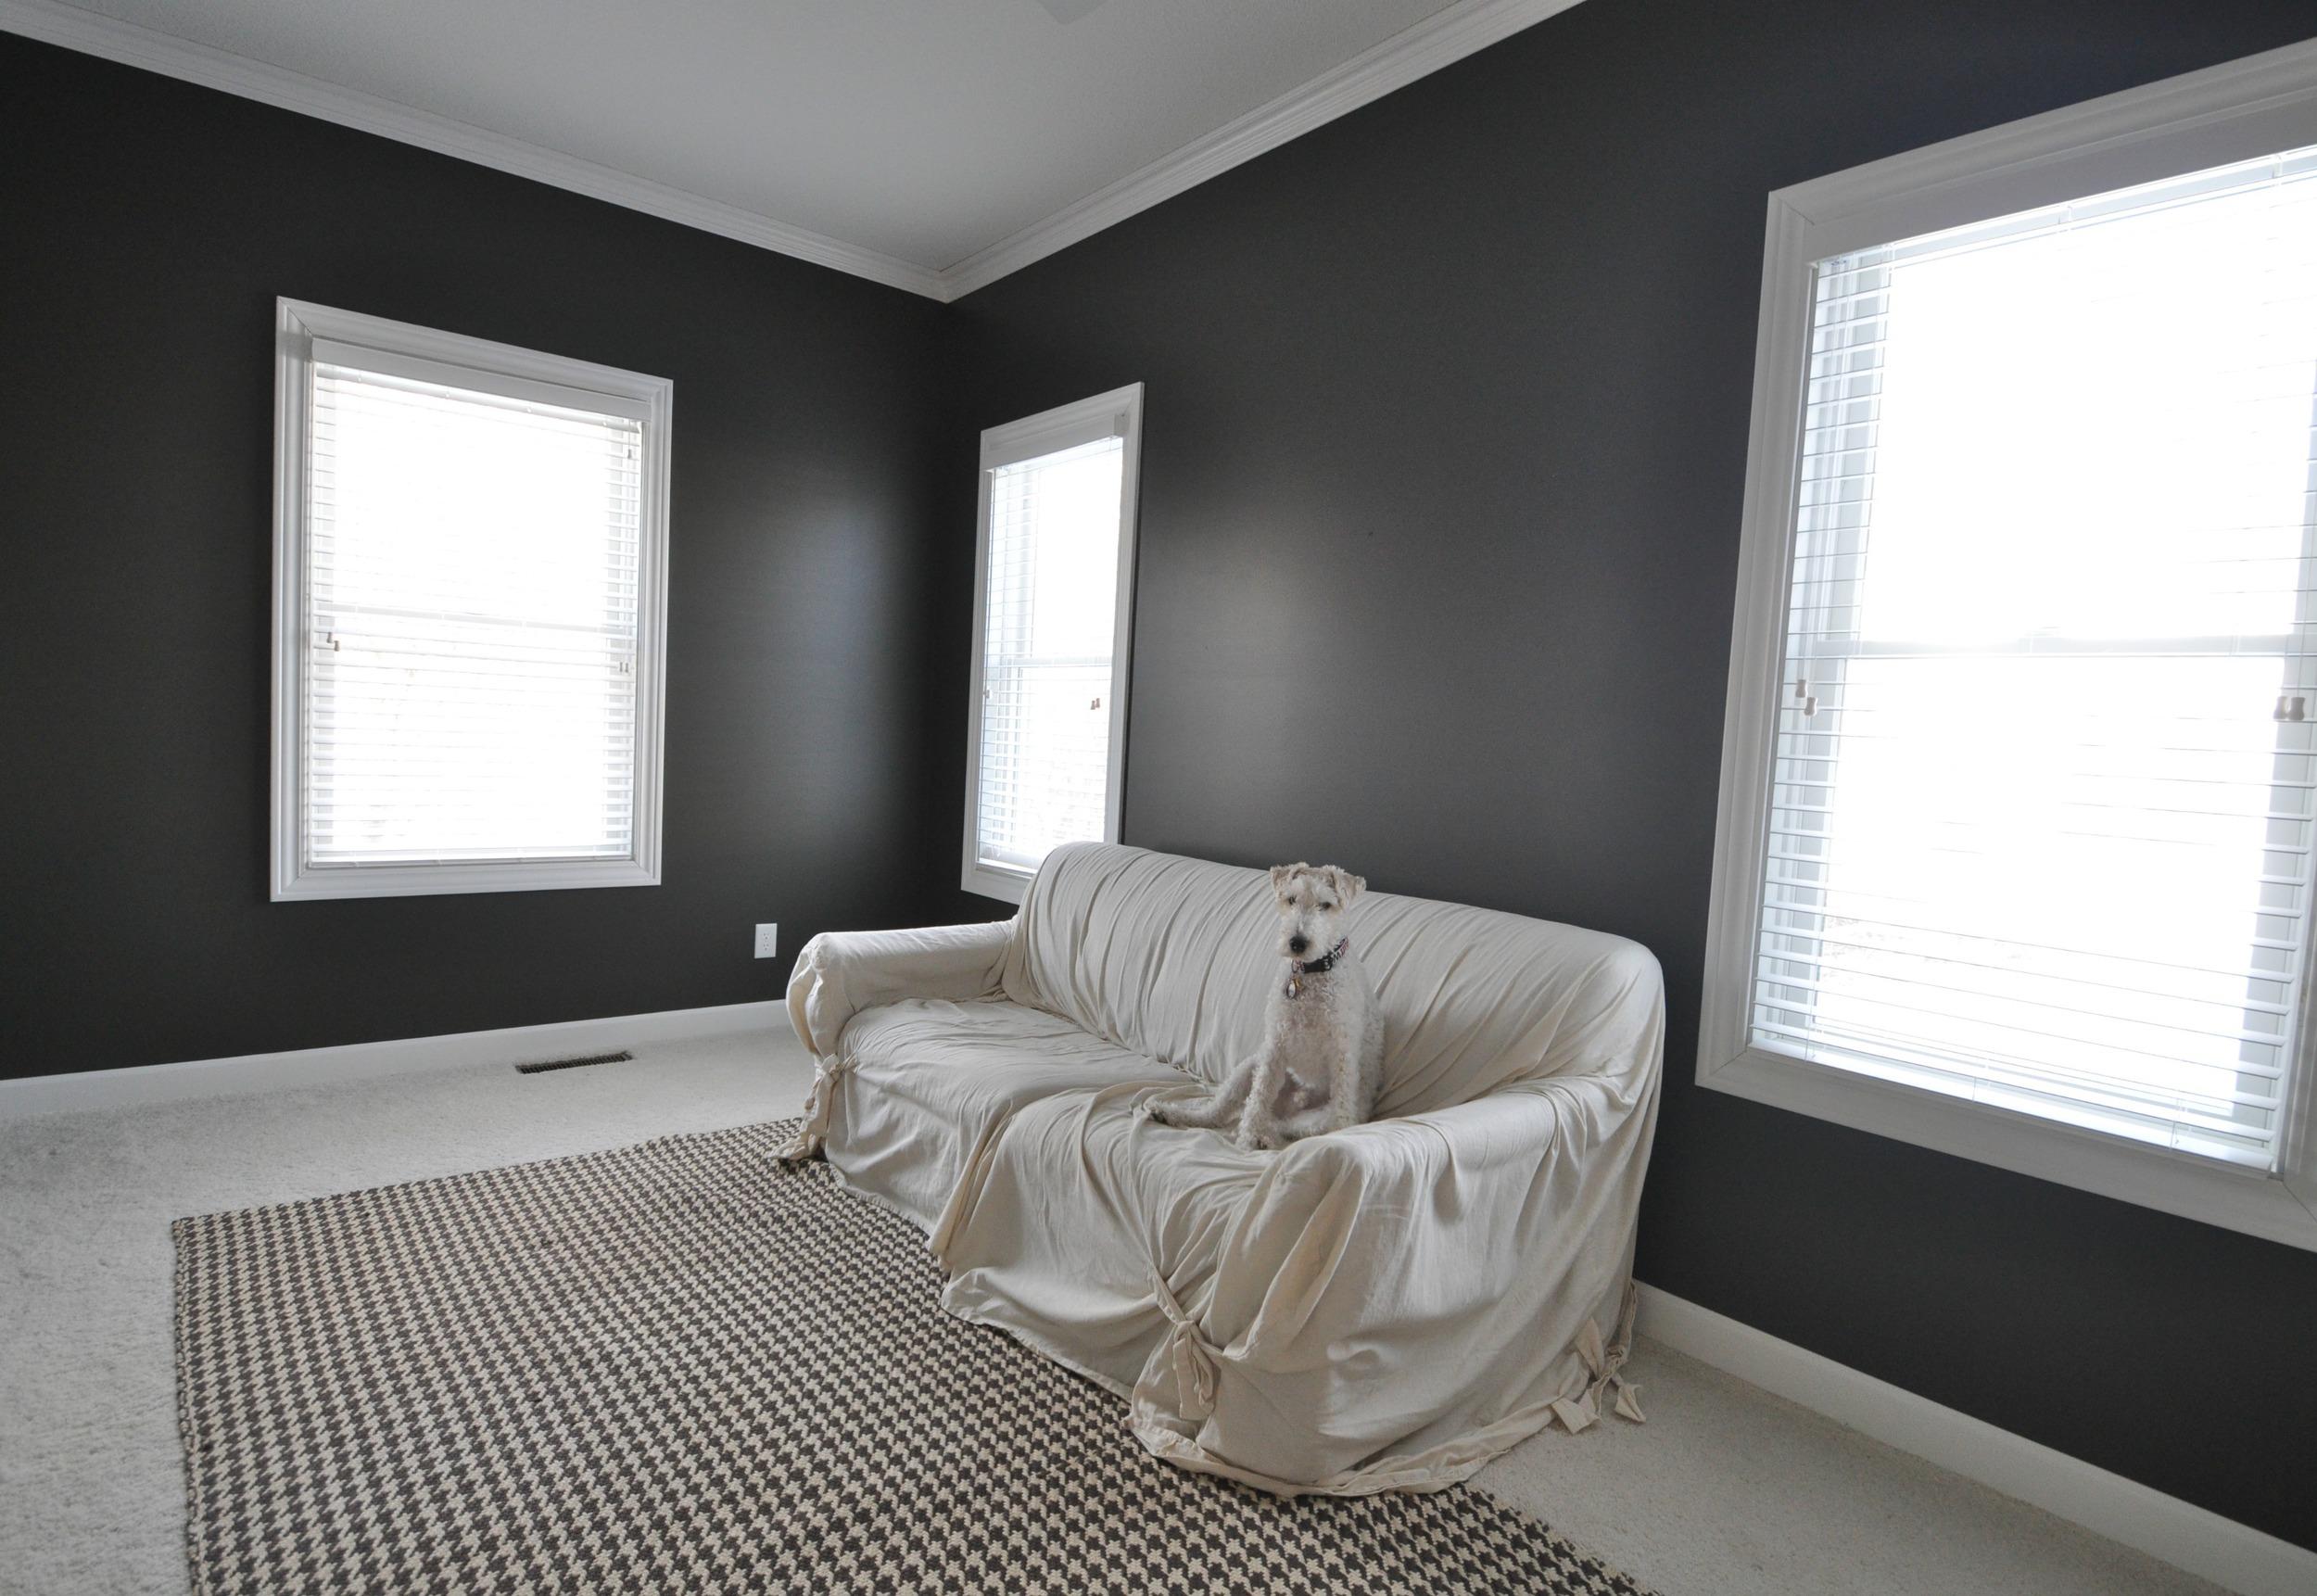 Sherwin Williams Thunder Gray   Decor and the Dog